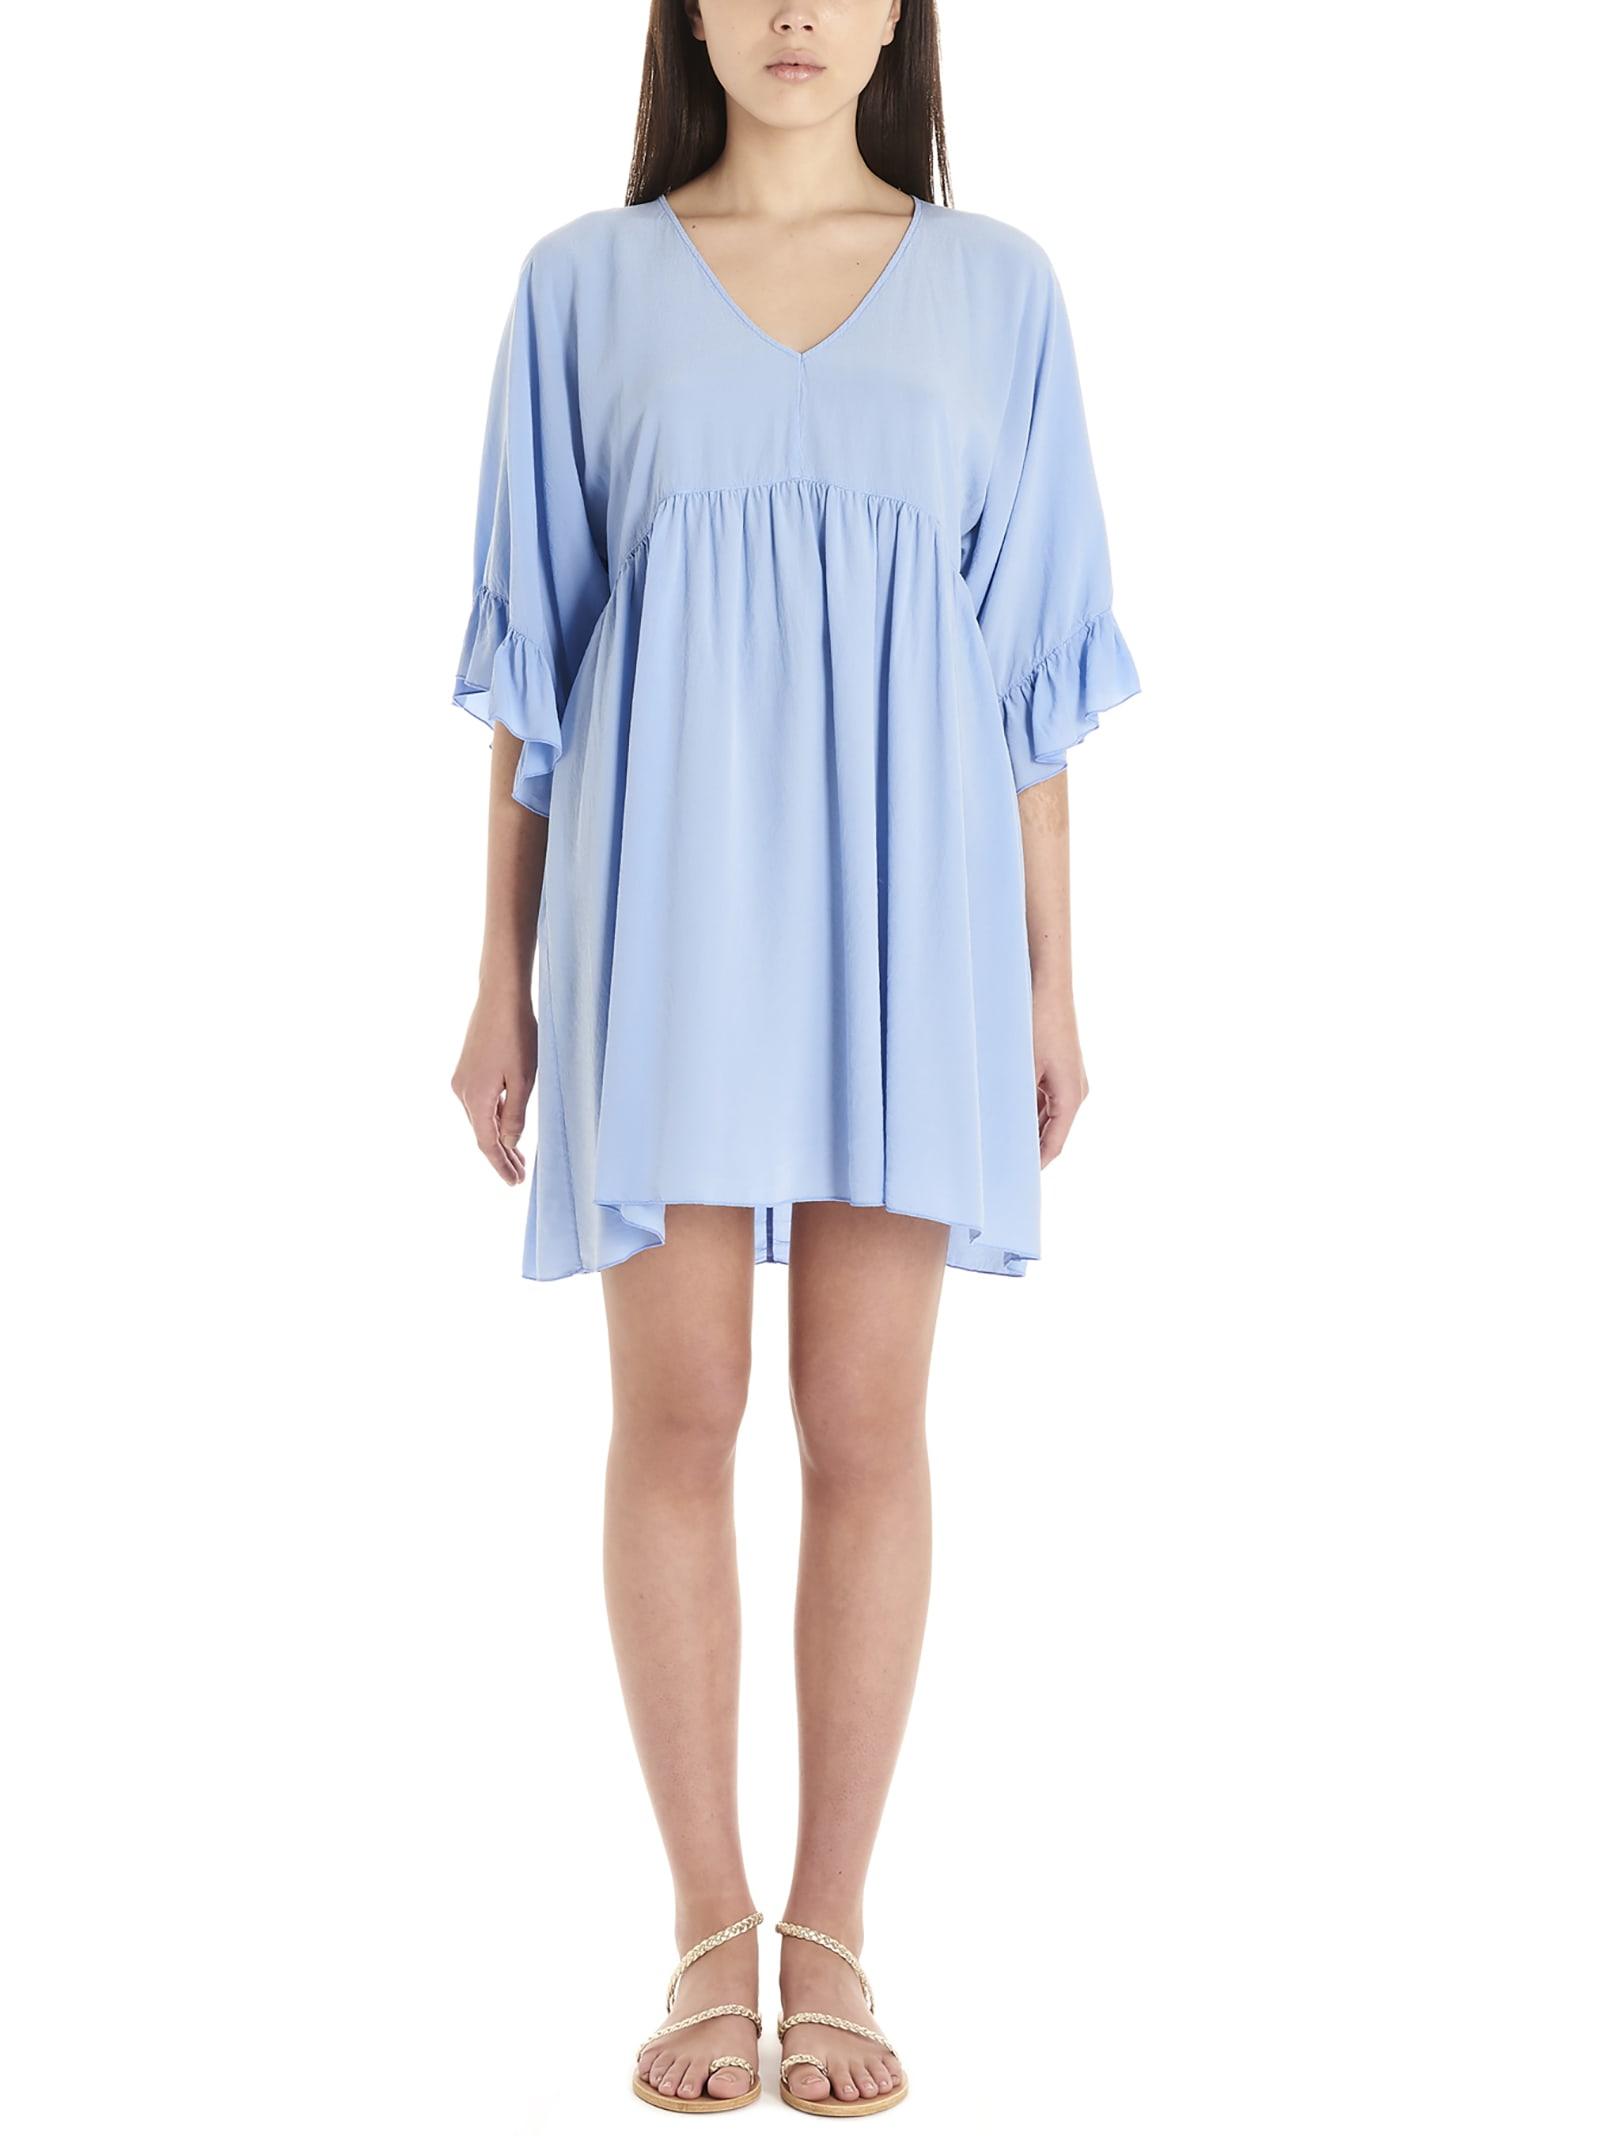 Buy Fisico - Cristina Ferrari Dress online, shop Fisico - Cristina Ferrari with free shipping